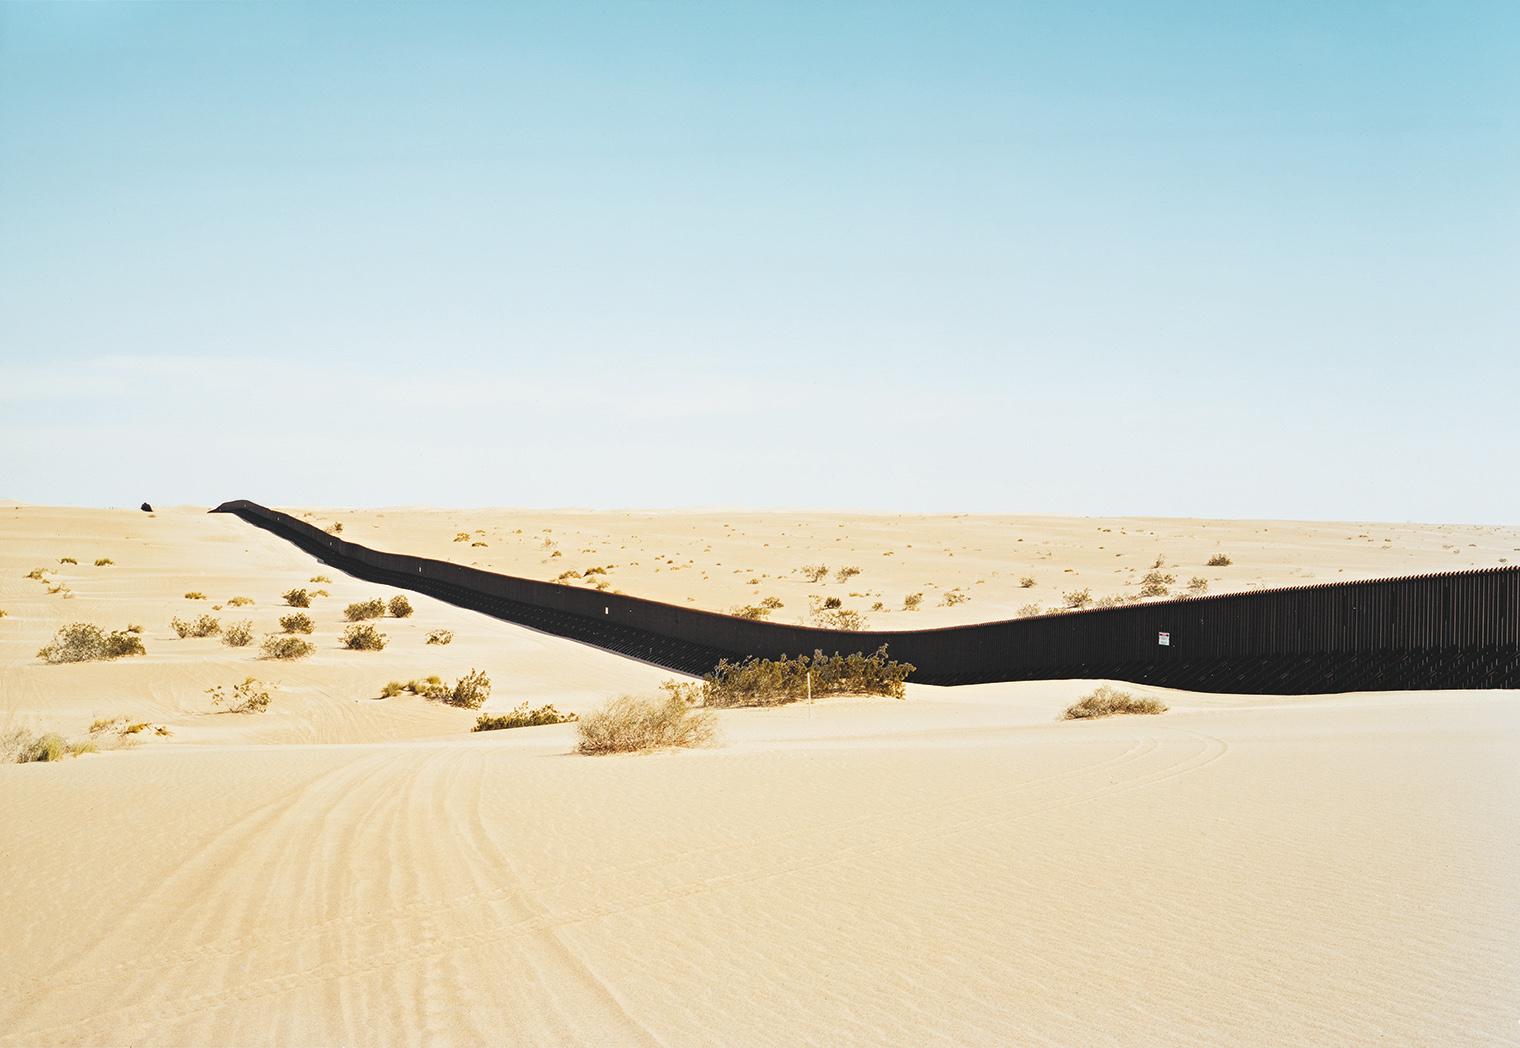 Untitled (Dunes) near El Centro, California, from The Border Series, by Victoria Sambunaris, 2010.